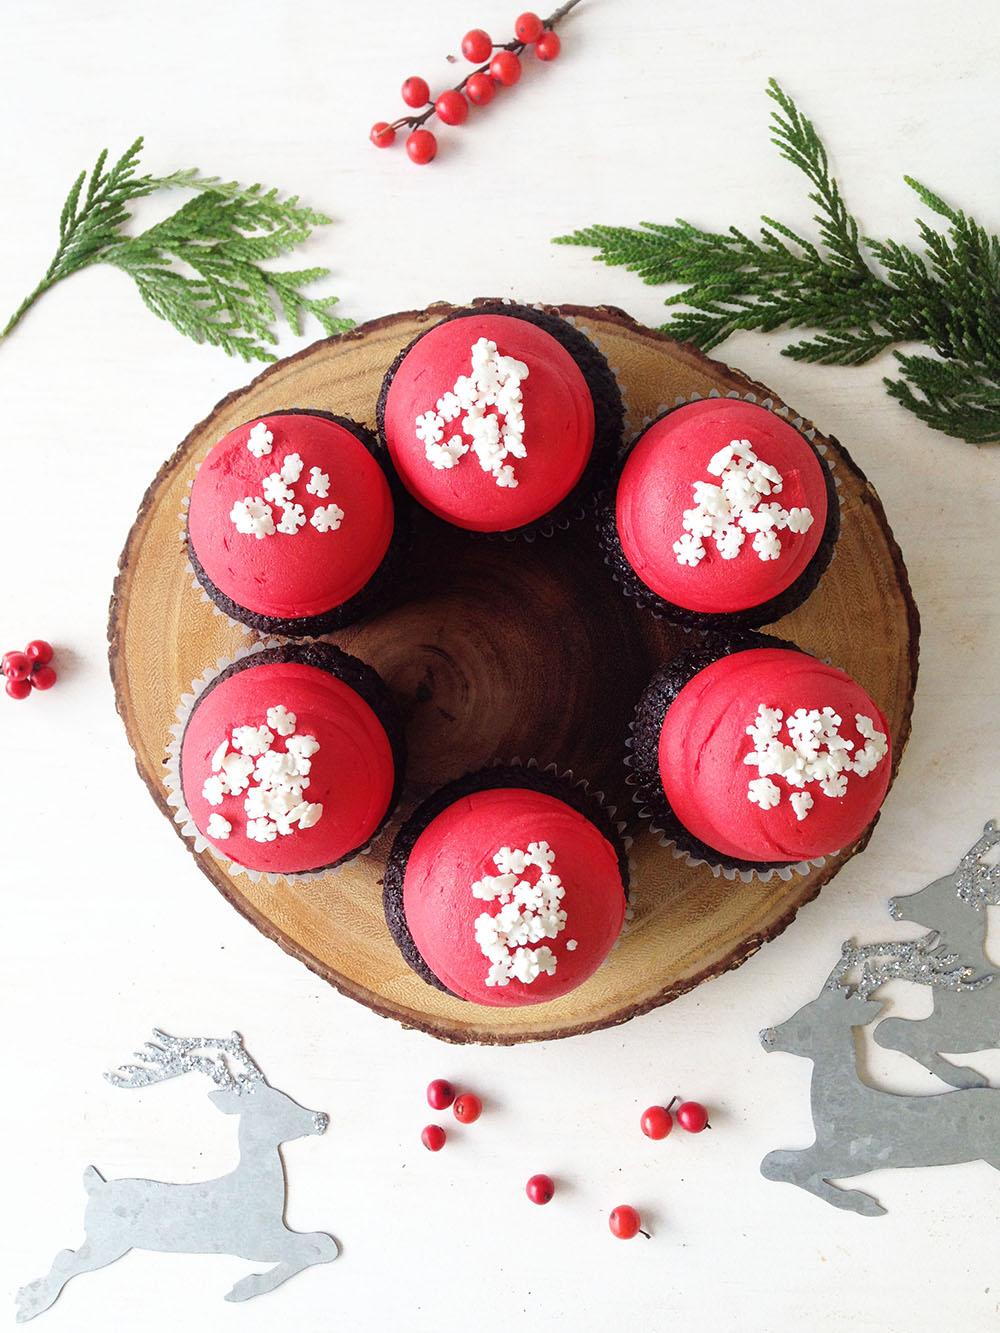 Chocolate Snowflake Cupcake - $3.25